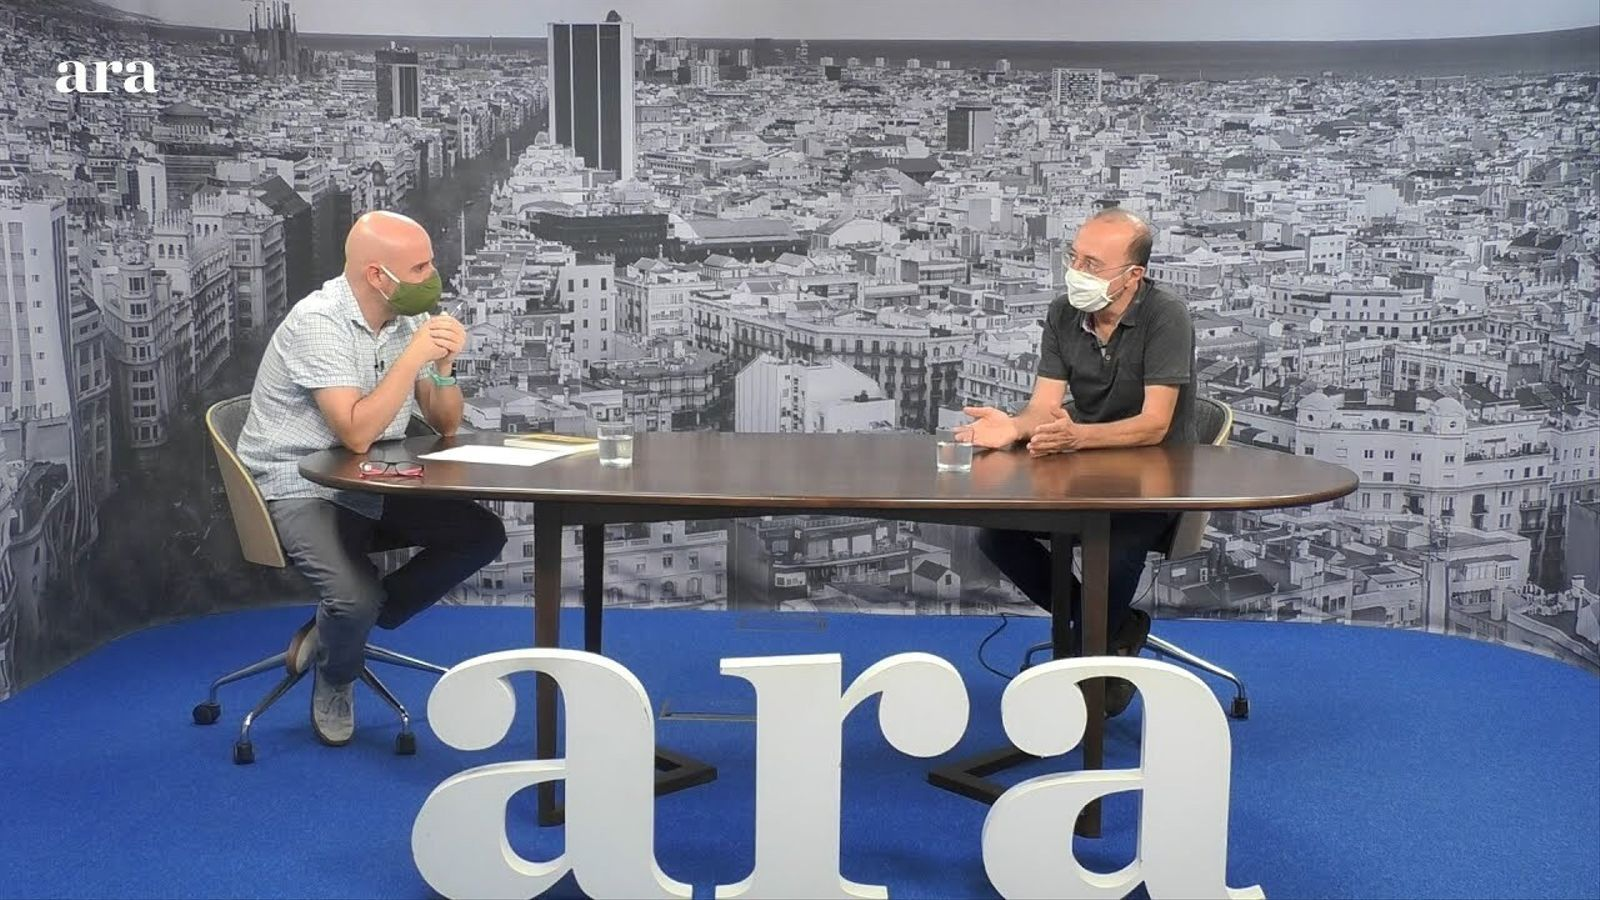 Entrevista de David Miró a Manel Lucas